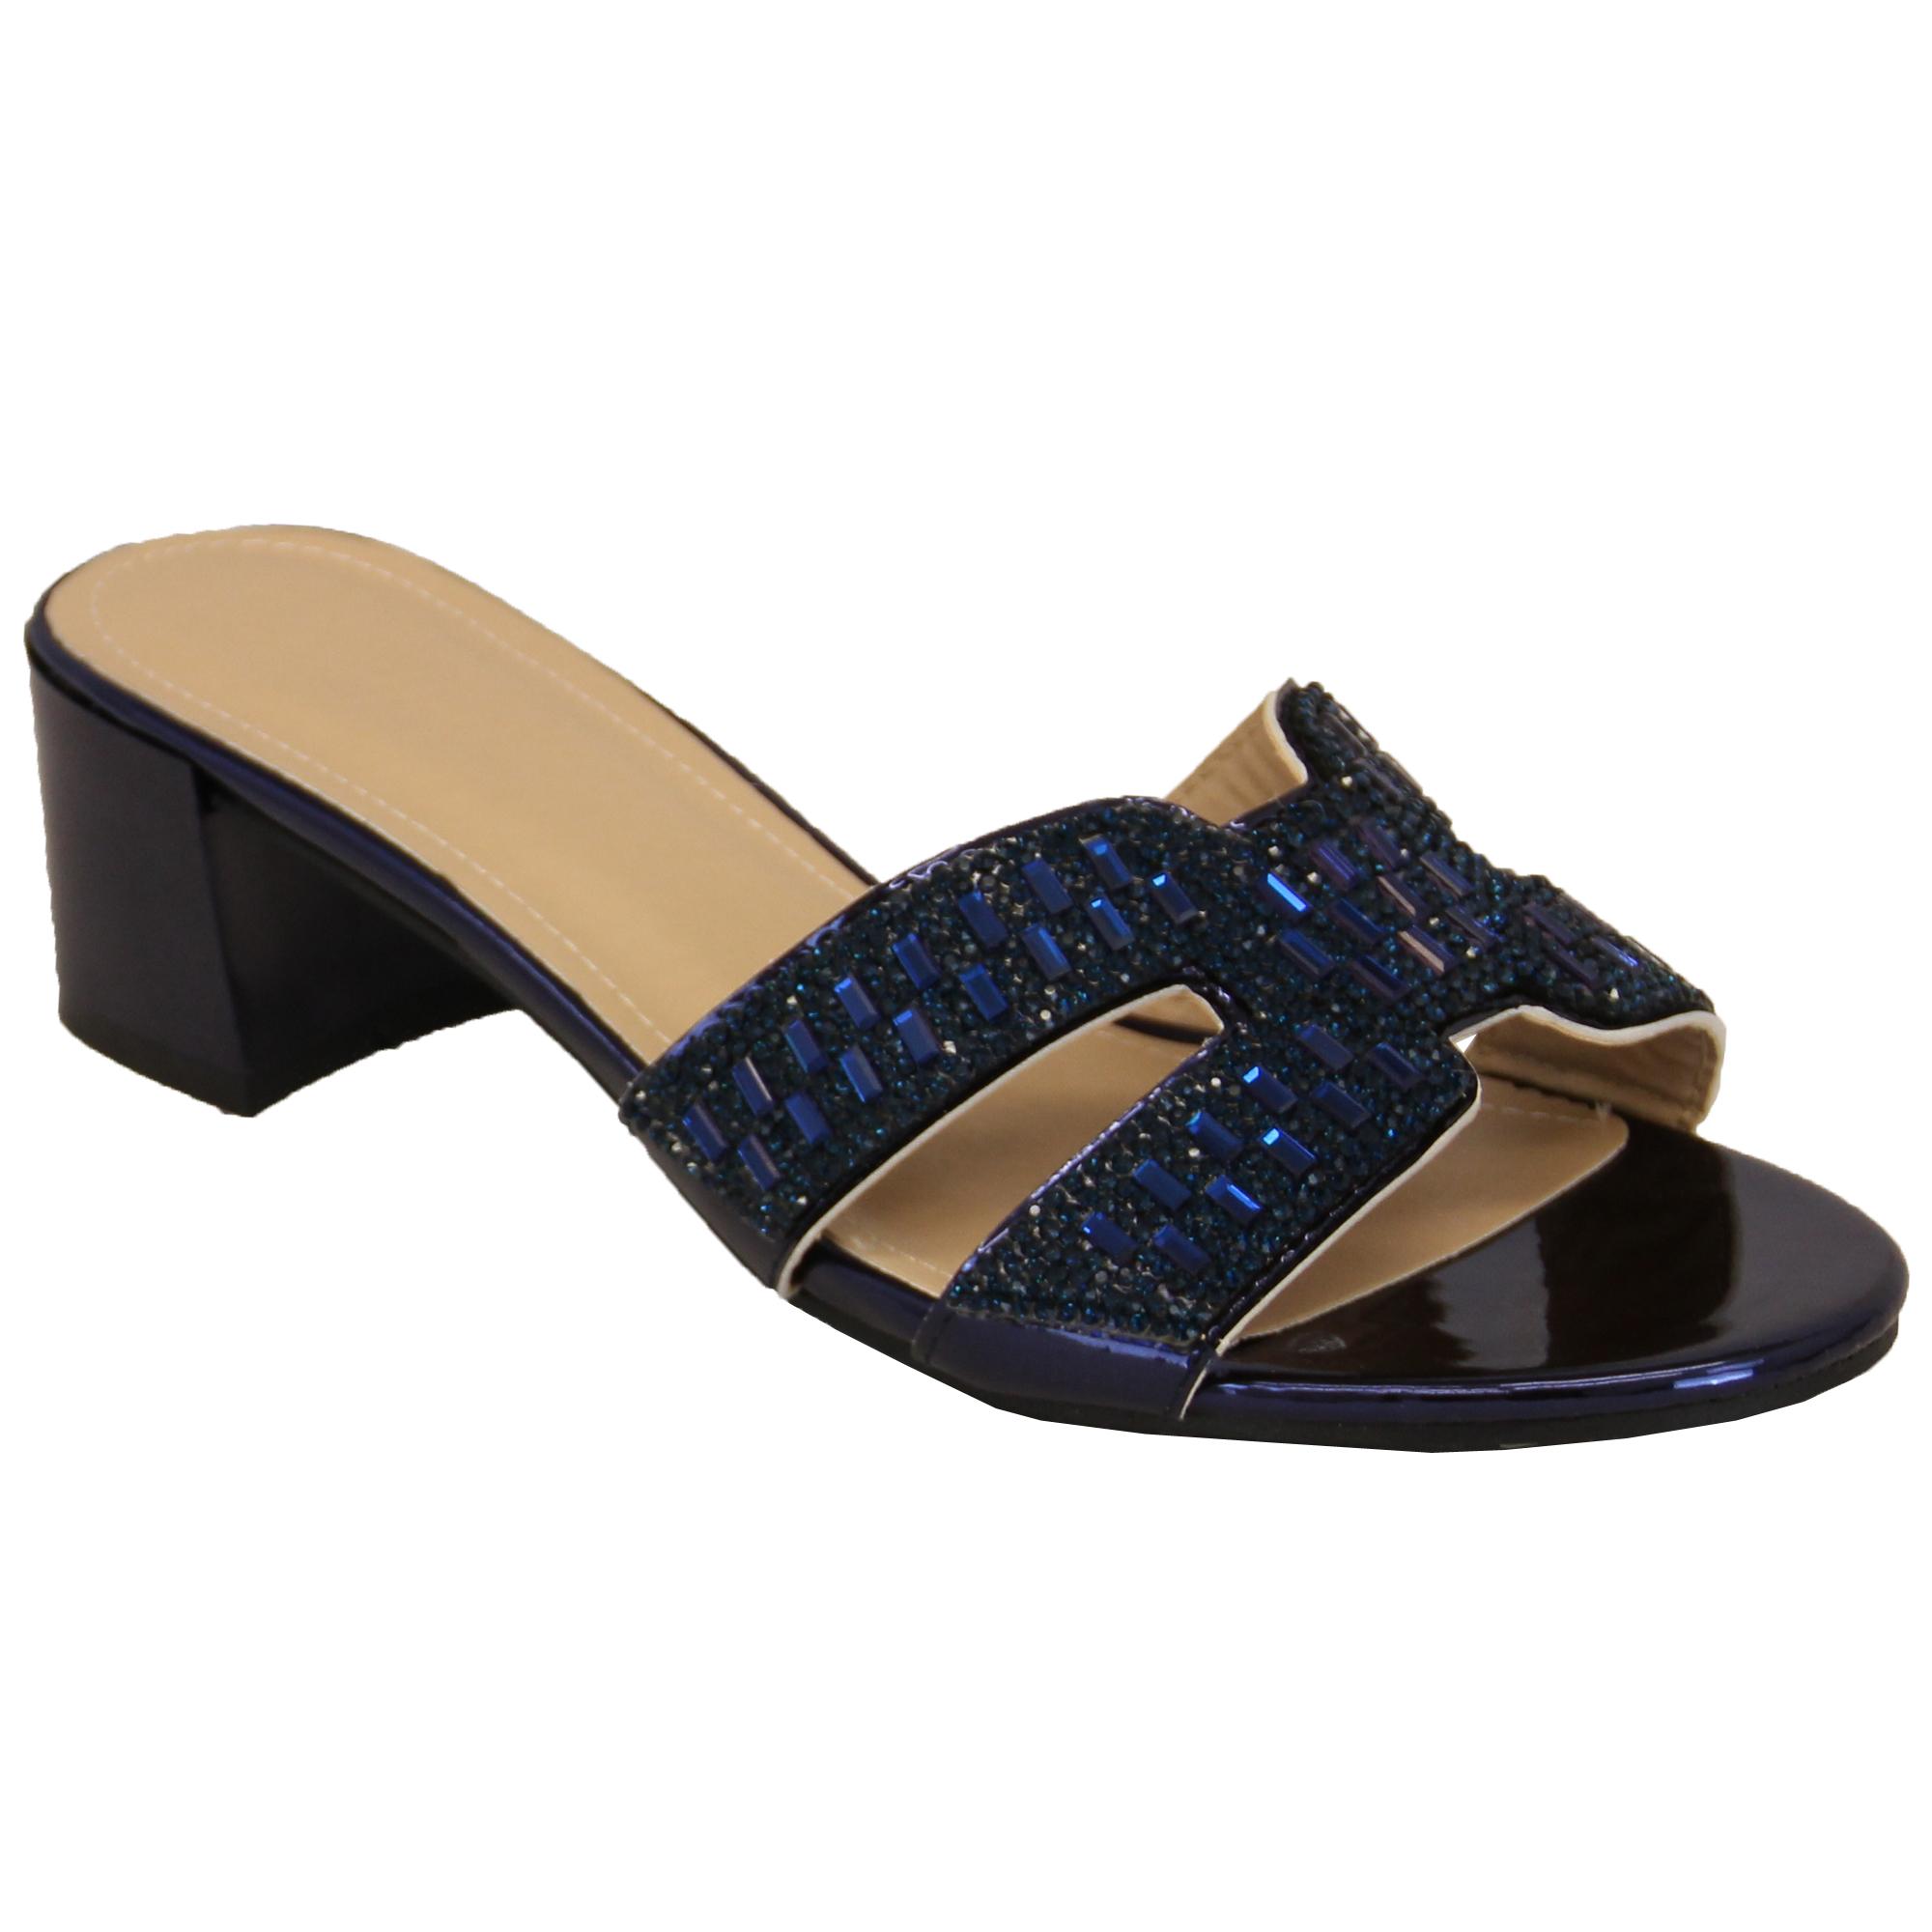 Ladies Diamante Bridesmaid Sandals Open Toe Slip On Block Heel Shoes Wedding New